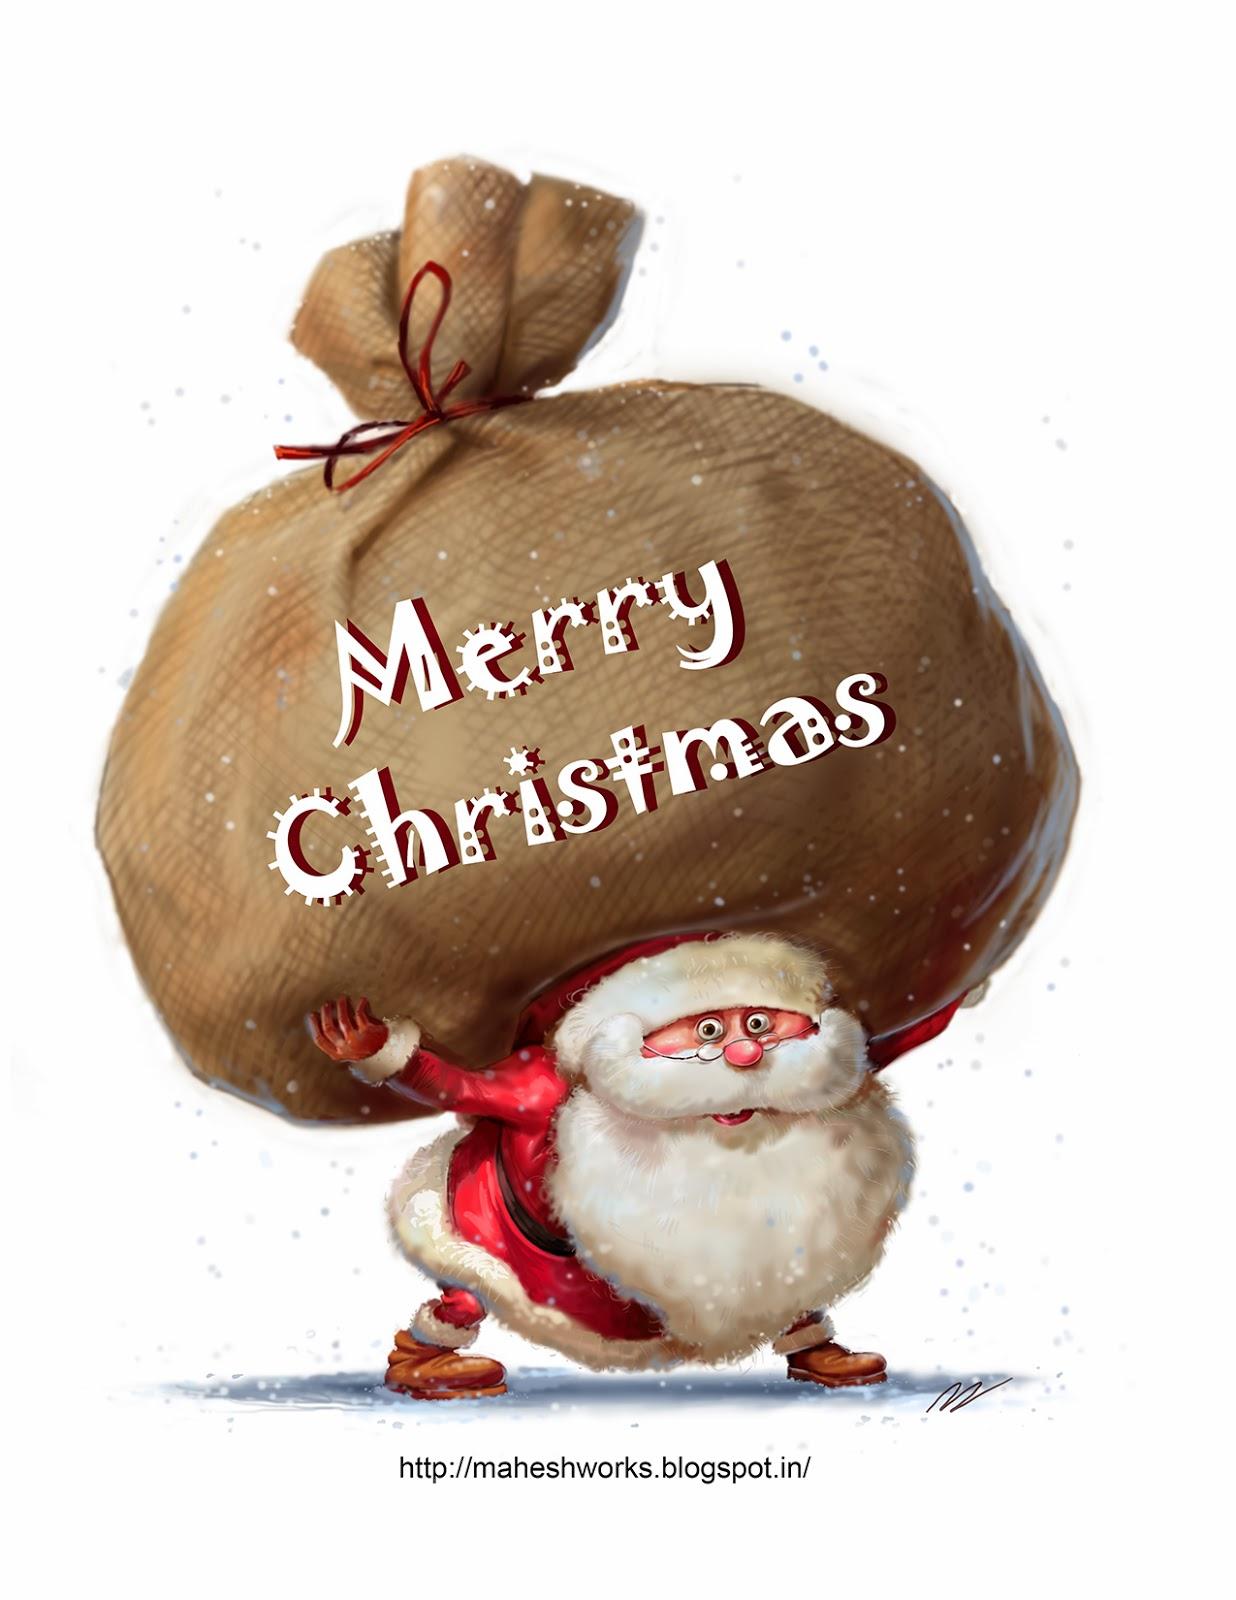 christmas greeting card design by mahesh nambiar View all Christmas